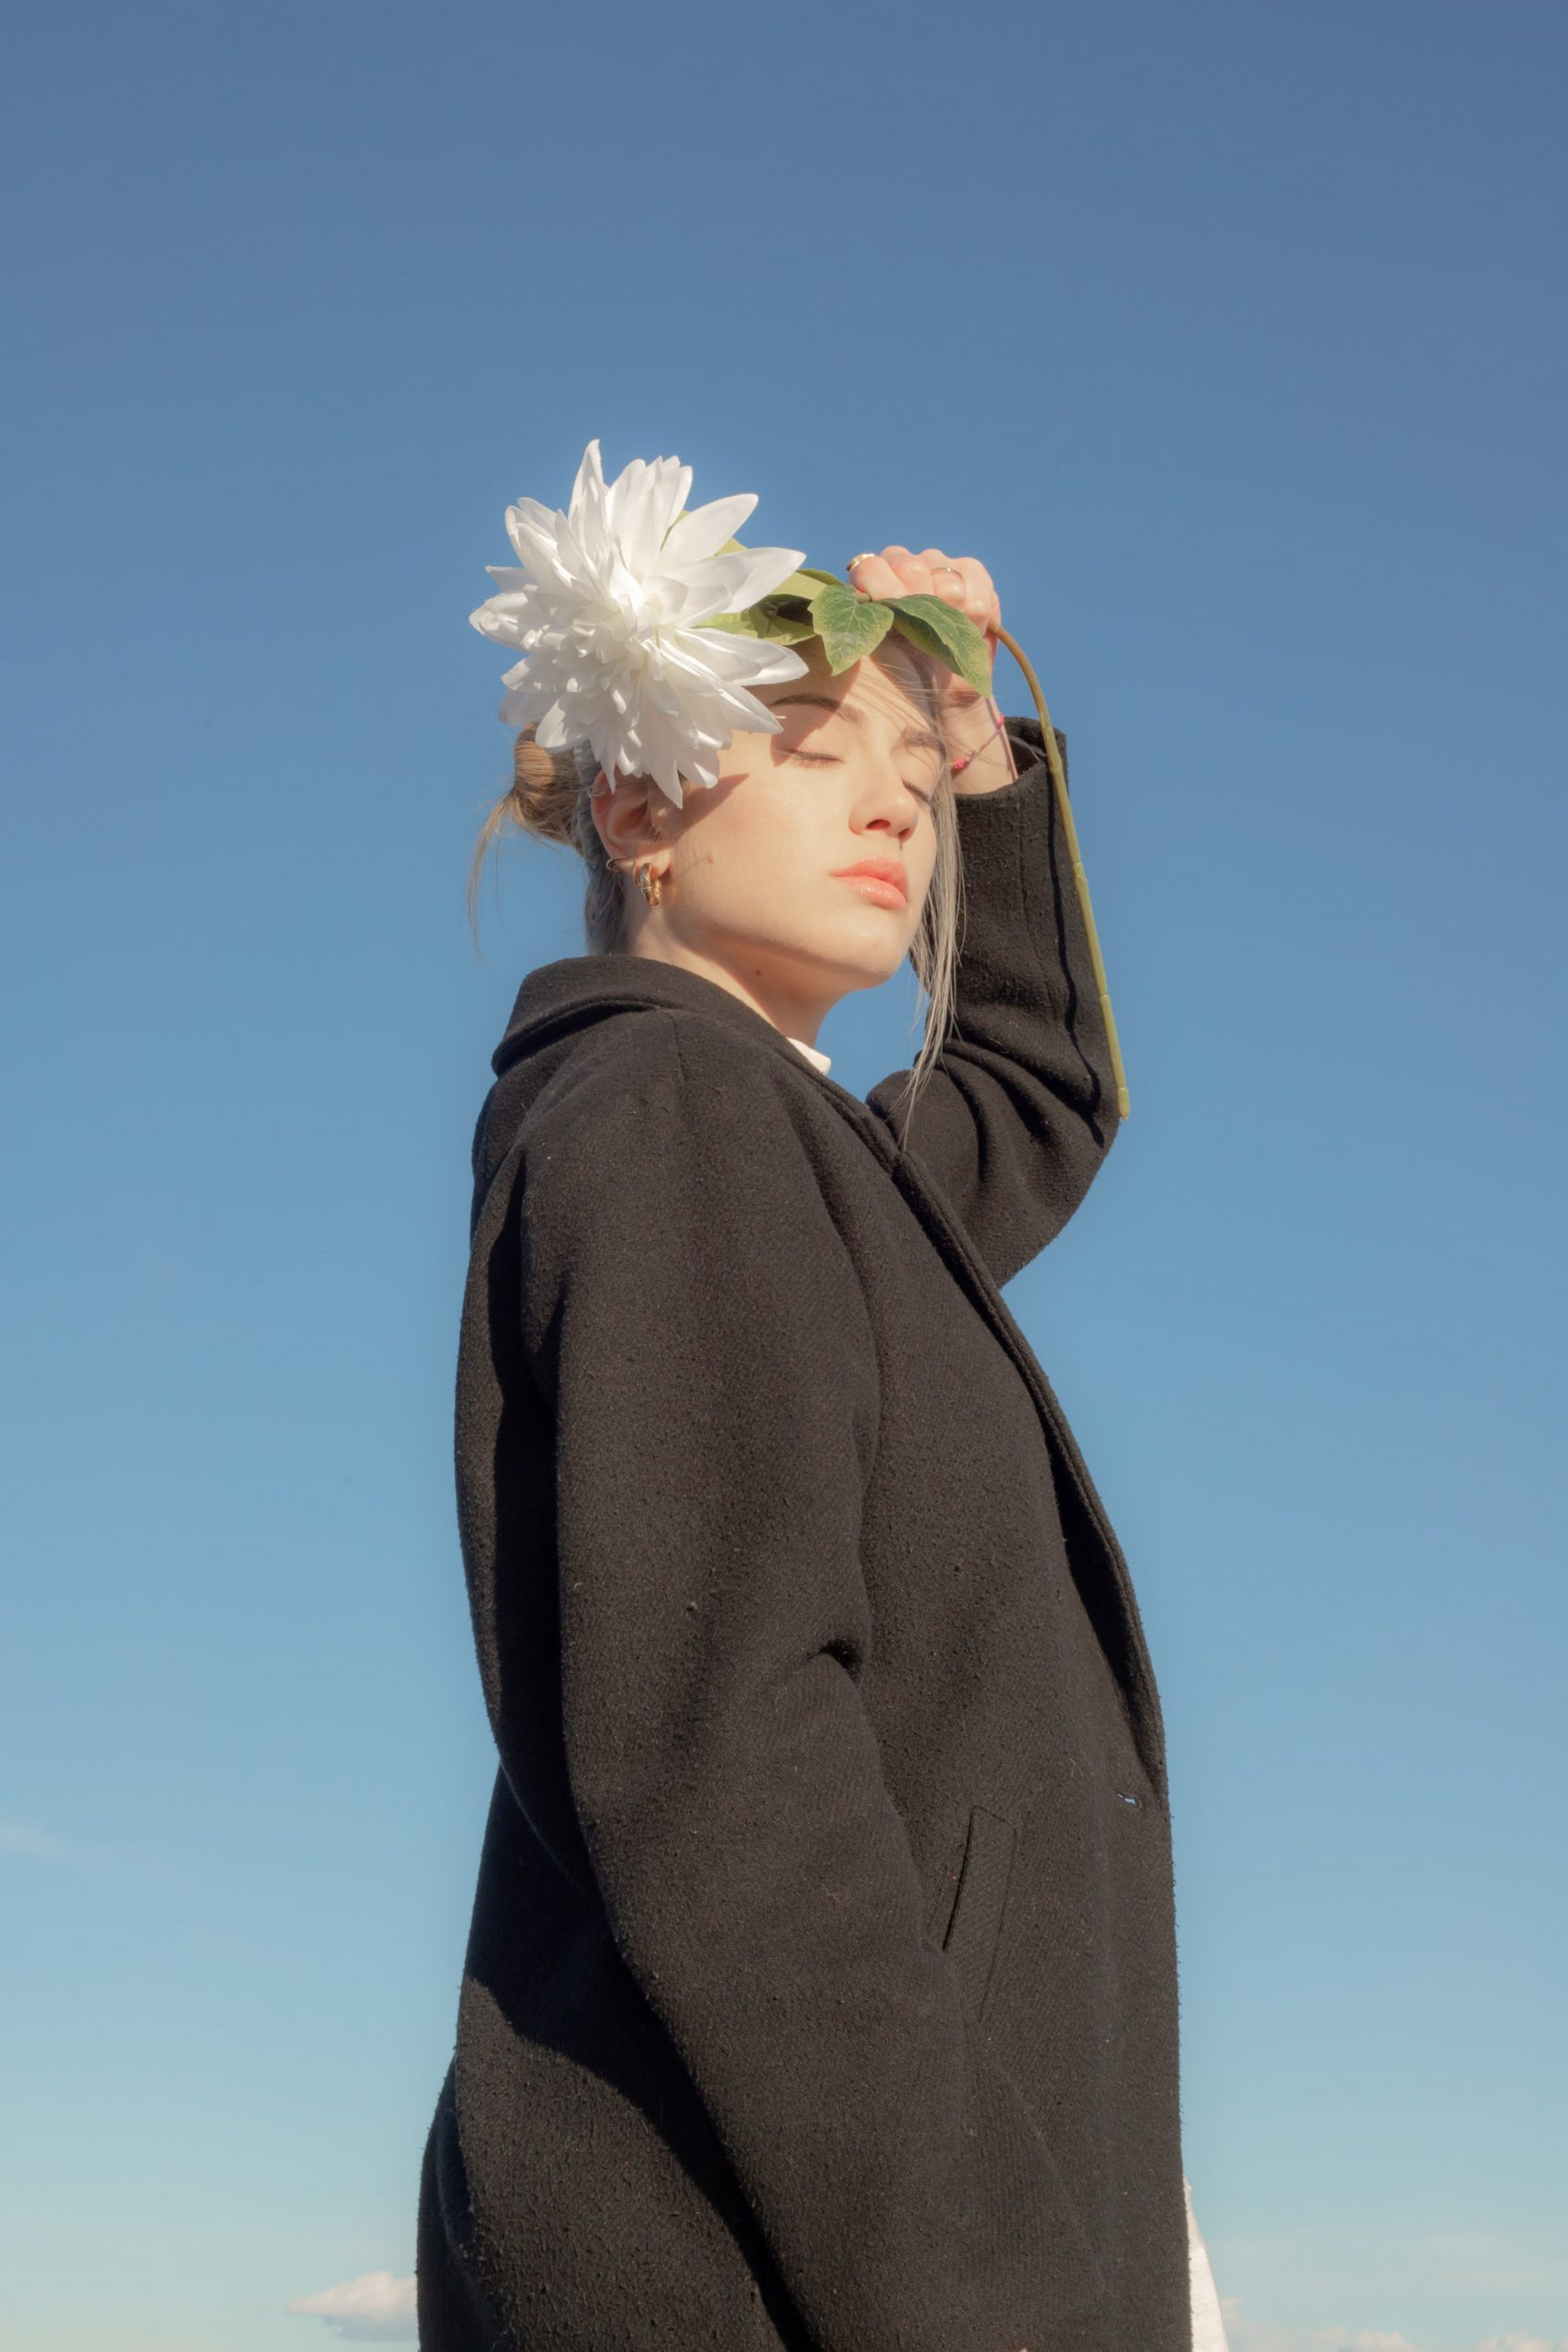 Categorie: Glamour, Fashion, Portrait - Photographer: NAOMI CANINO - Model:GIORGIA MASTRIA - Location: Catanzaro, CZ, Italia